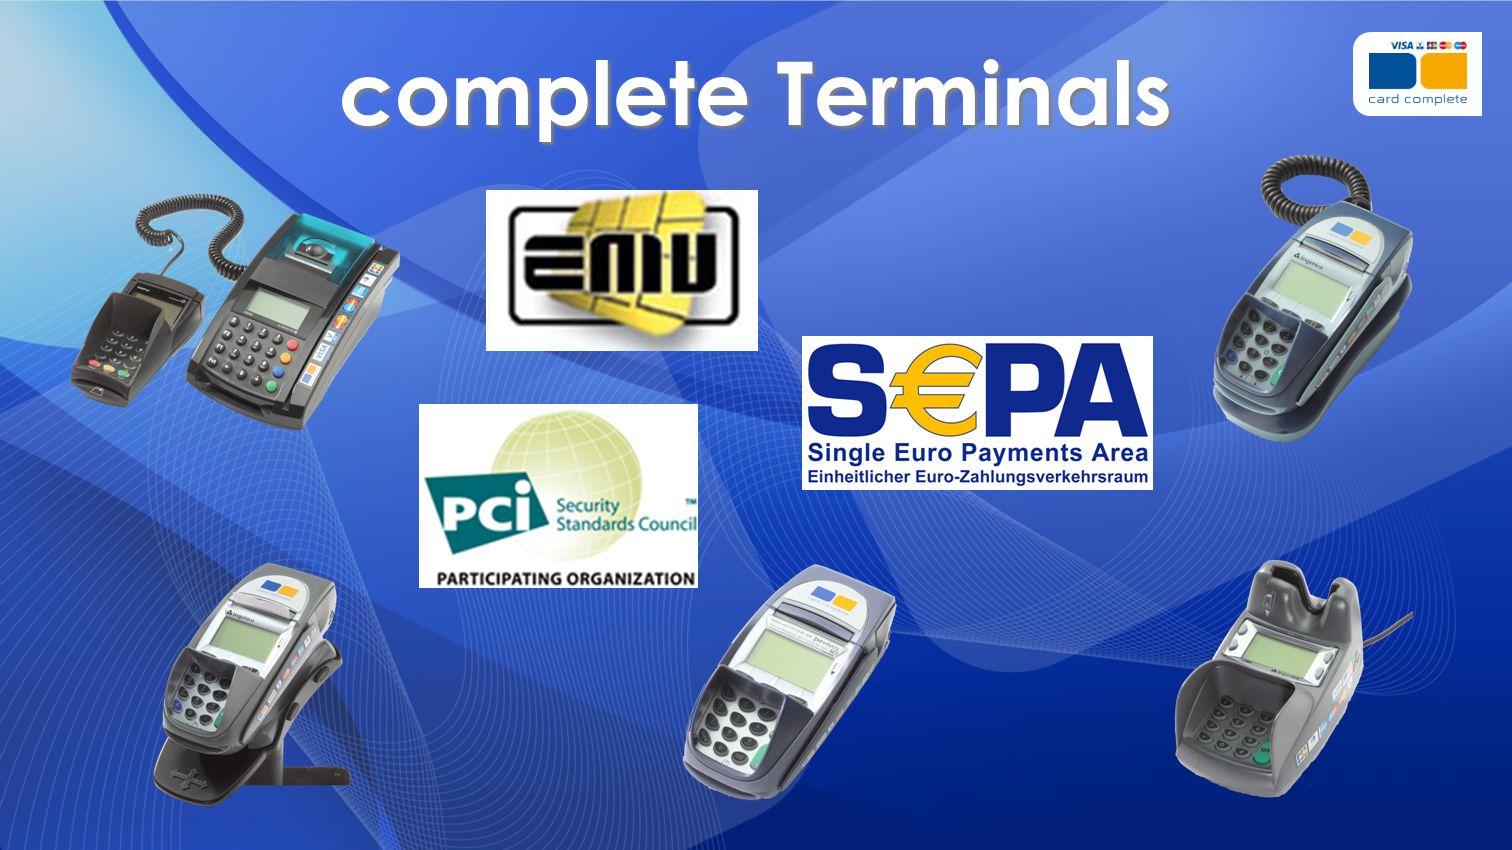 complete Terminals